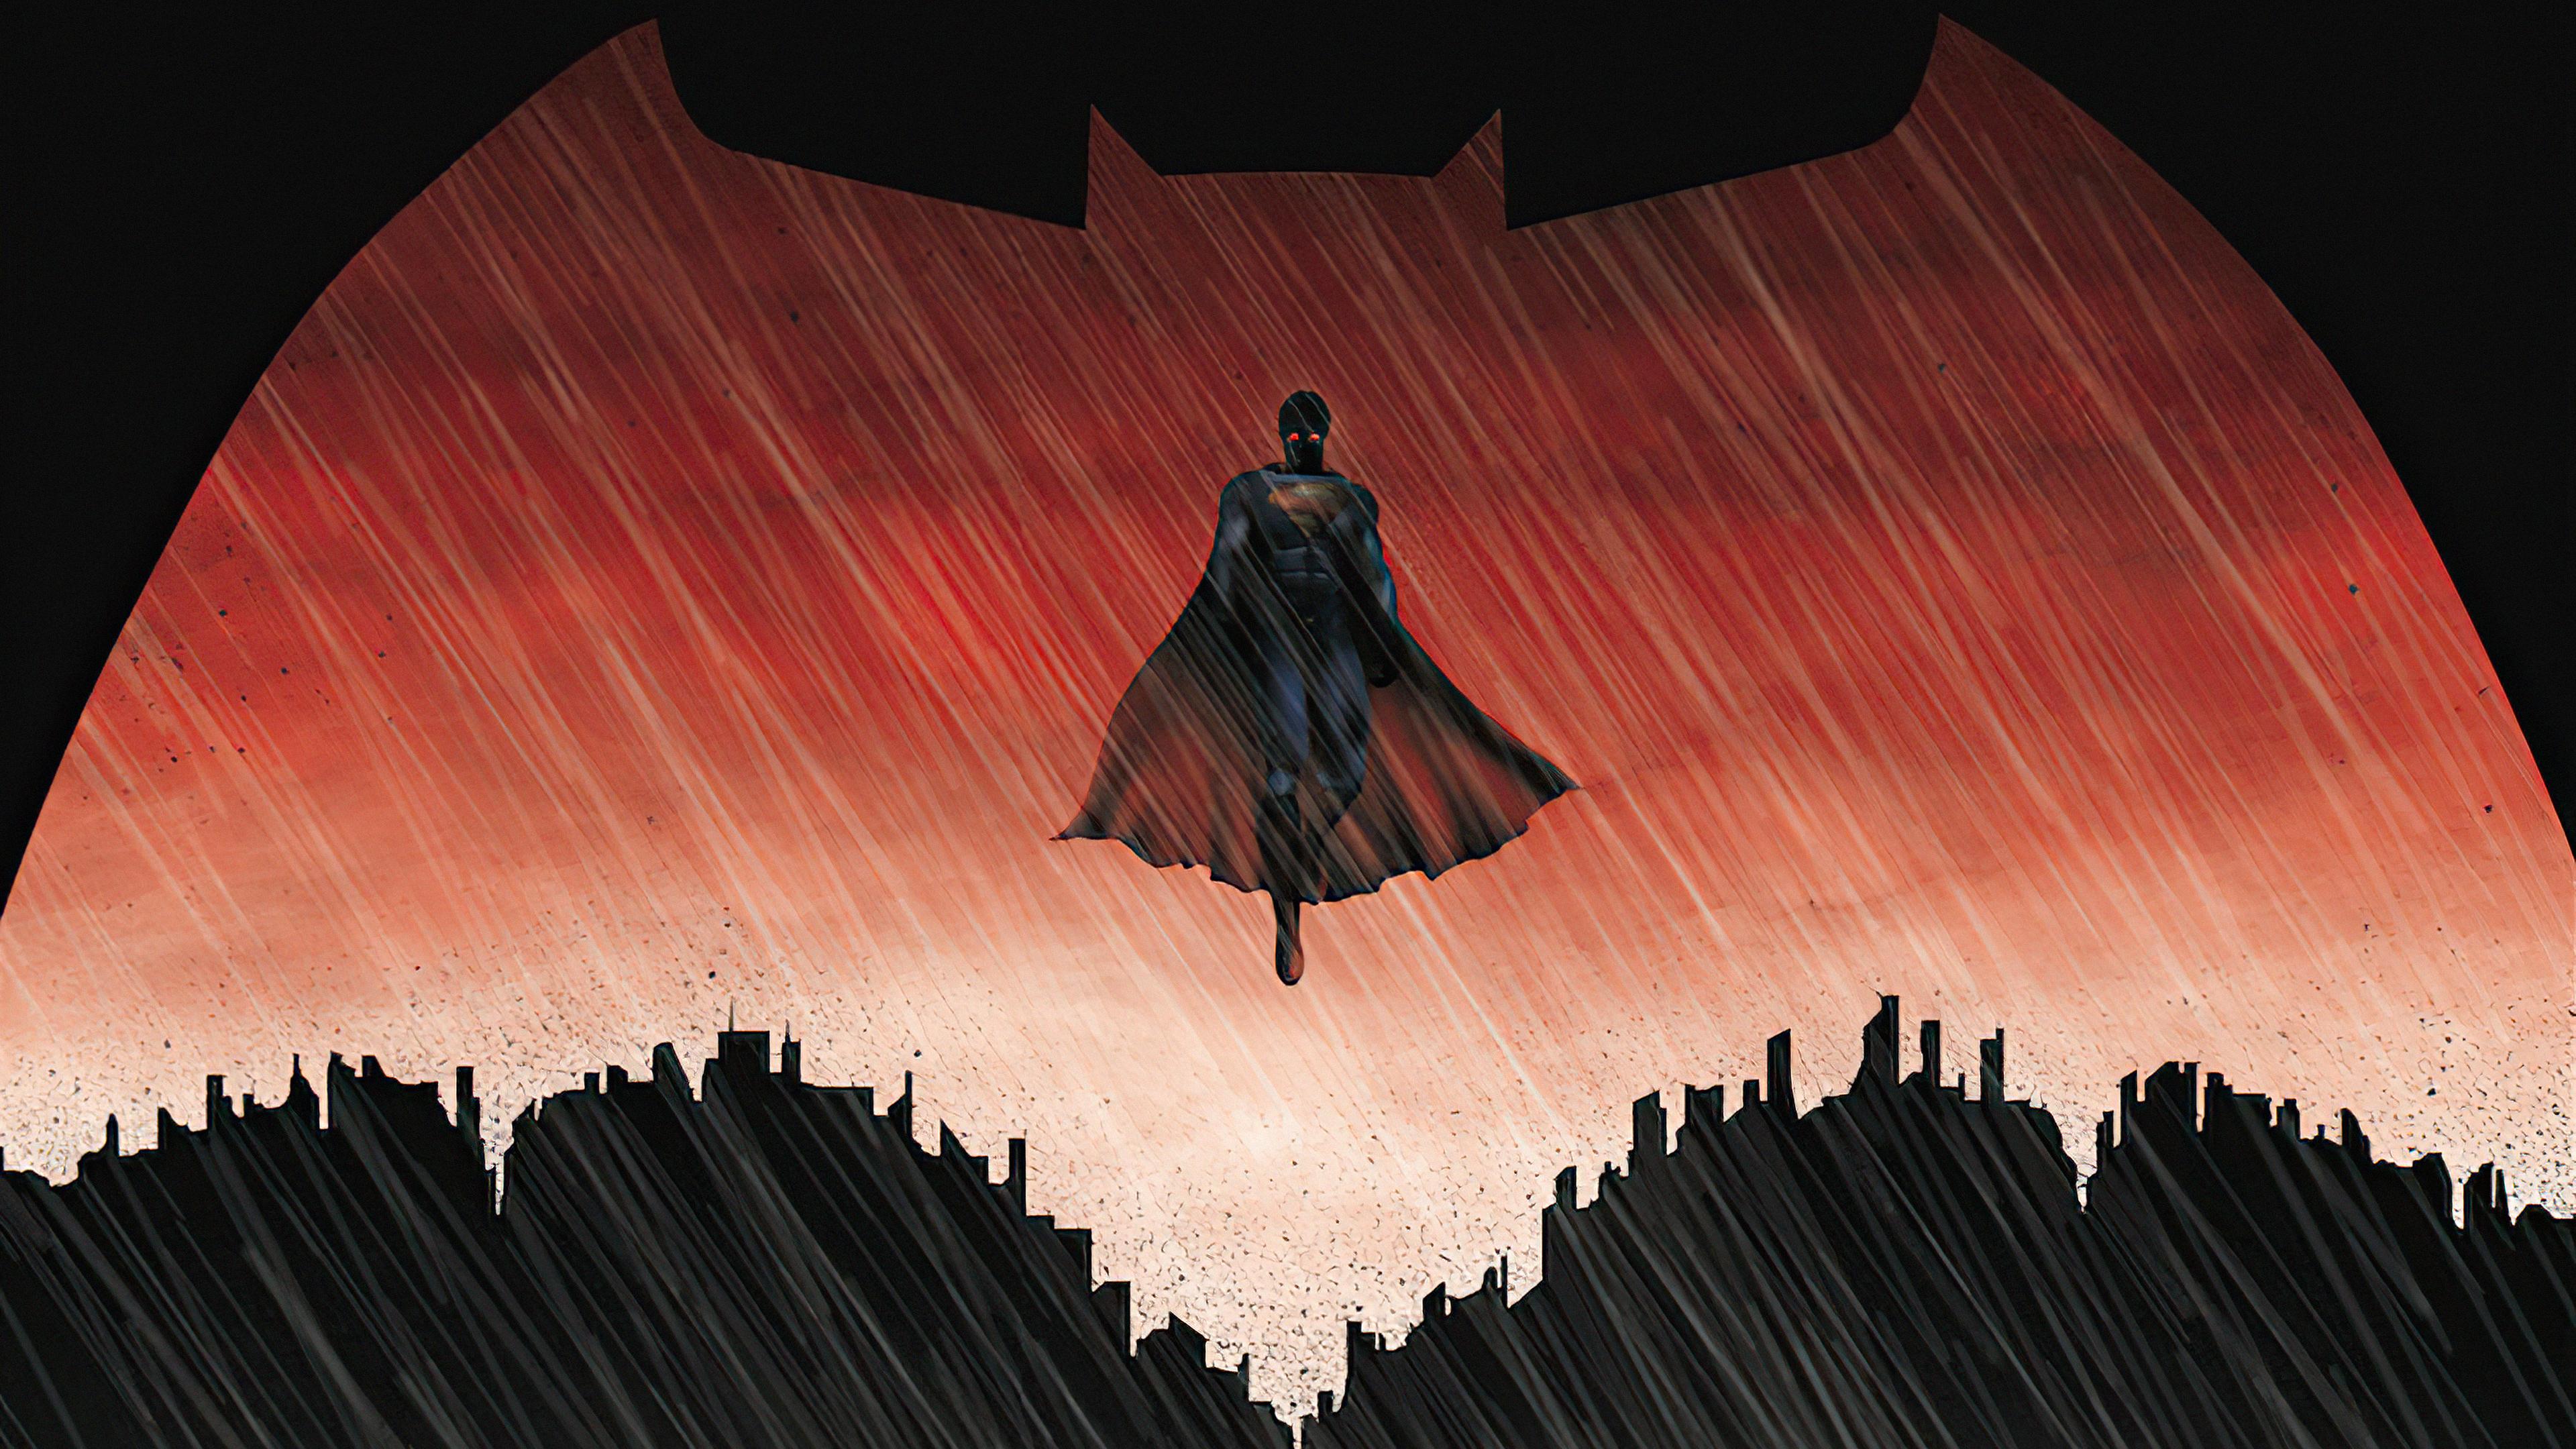 Wallpaper Superman inside Batman logo